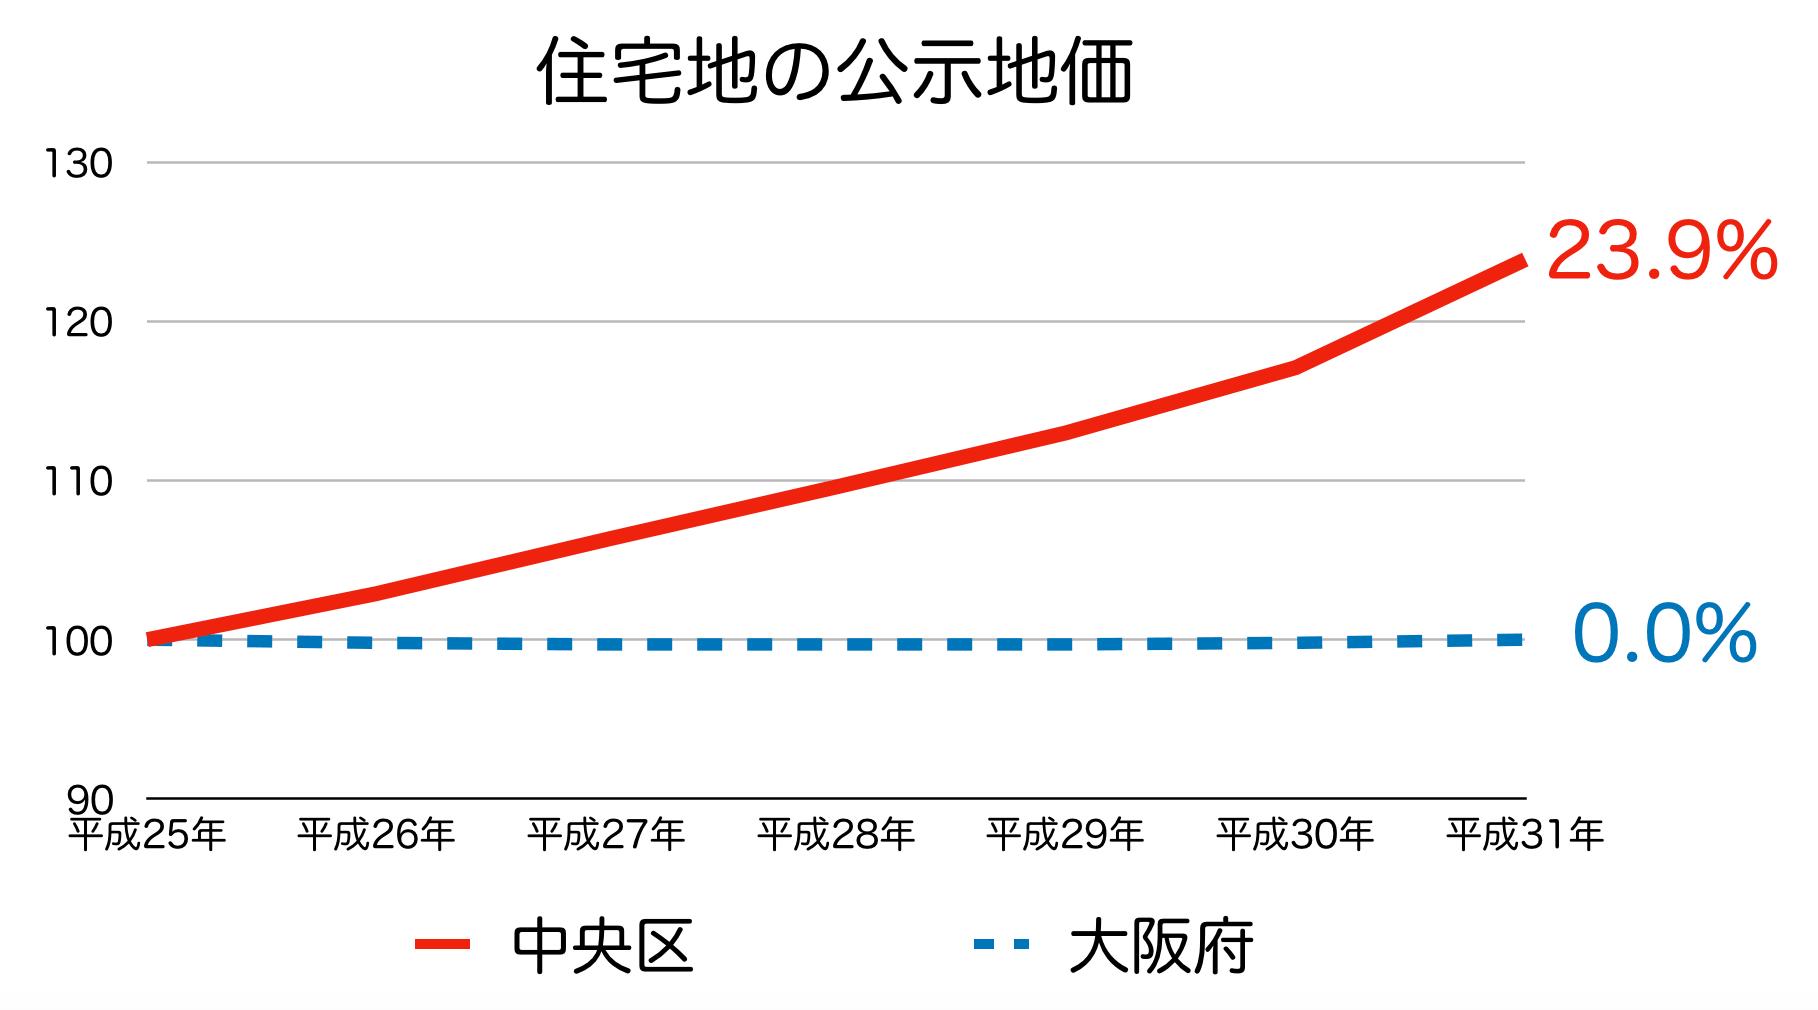 大阪市中央区の公示地価 H25-H31